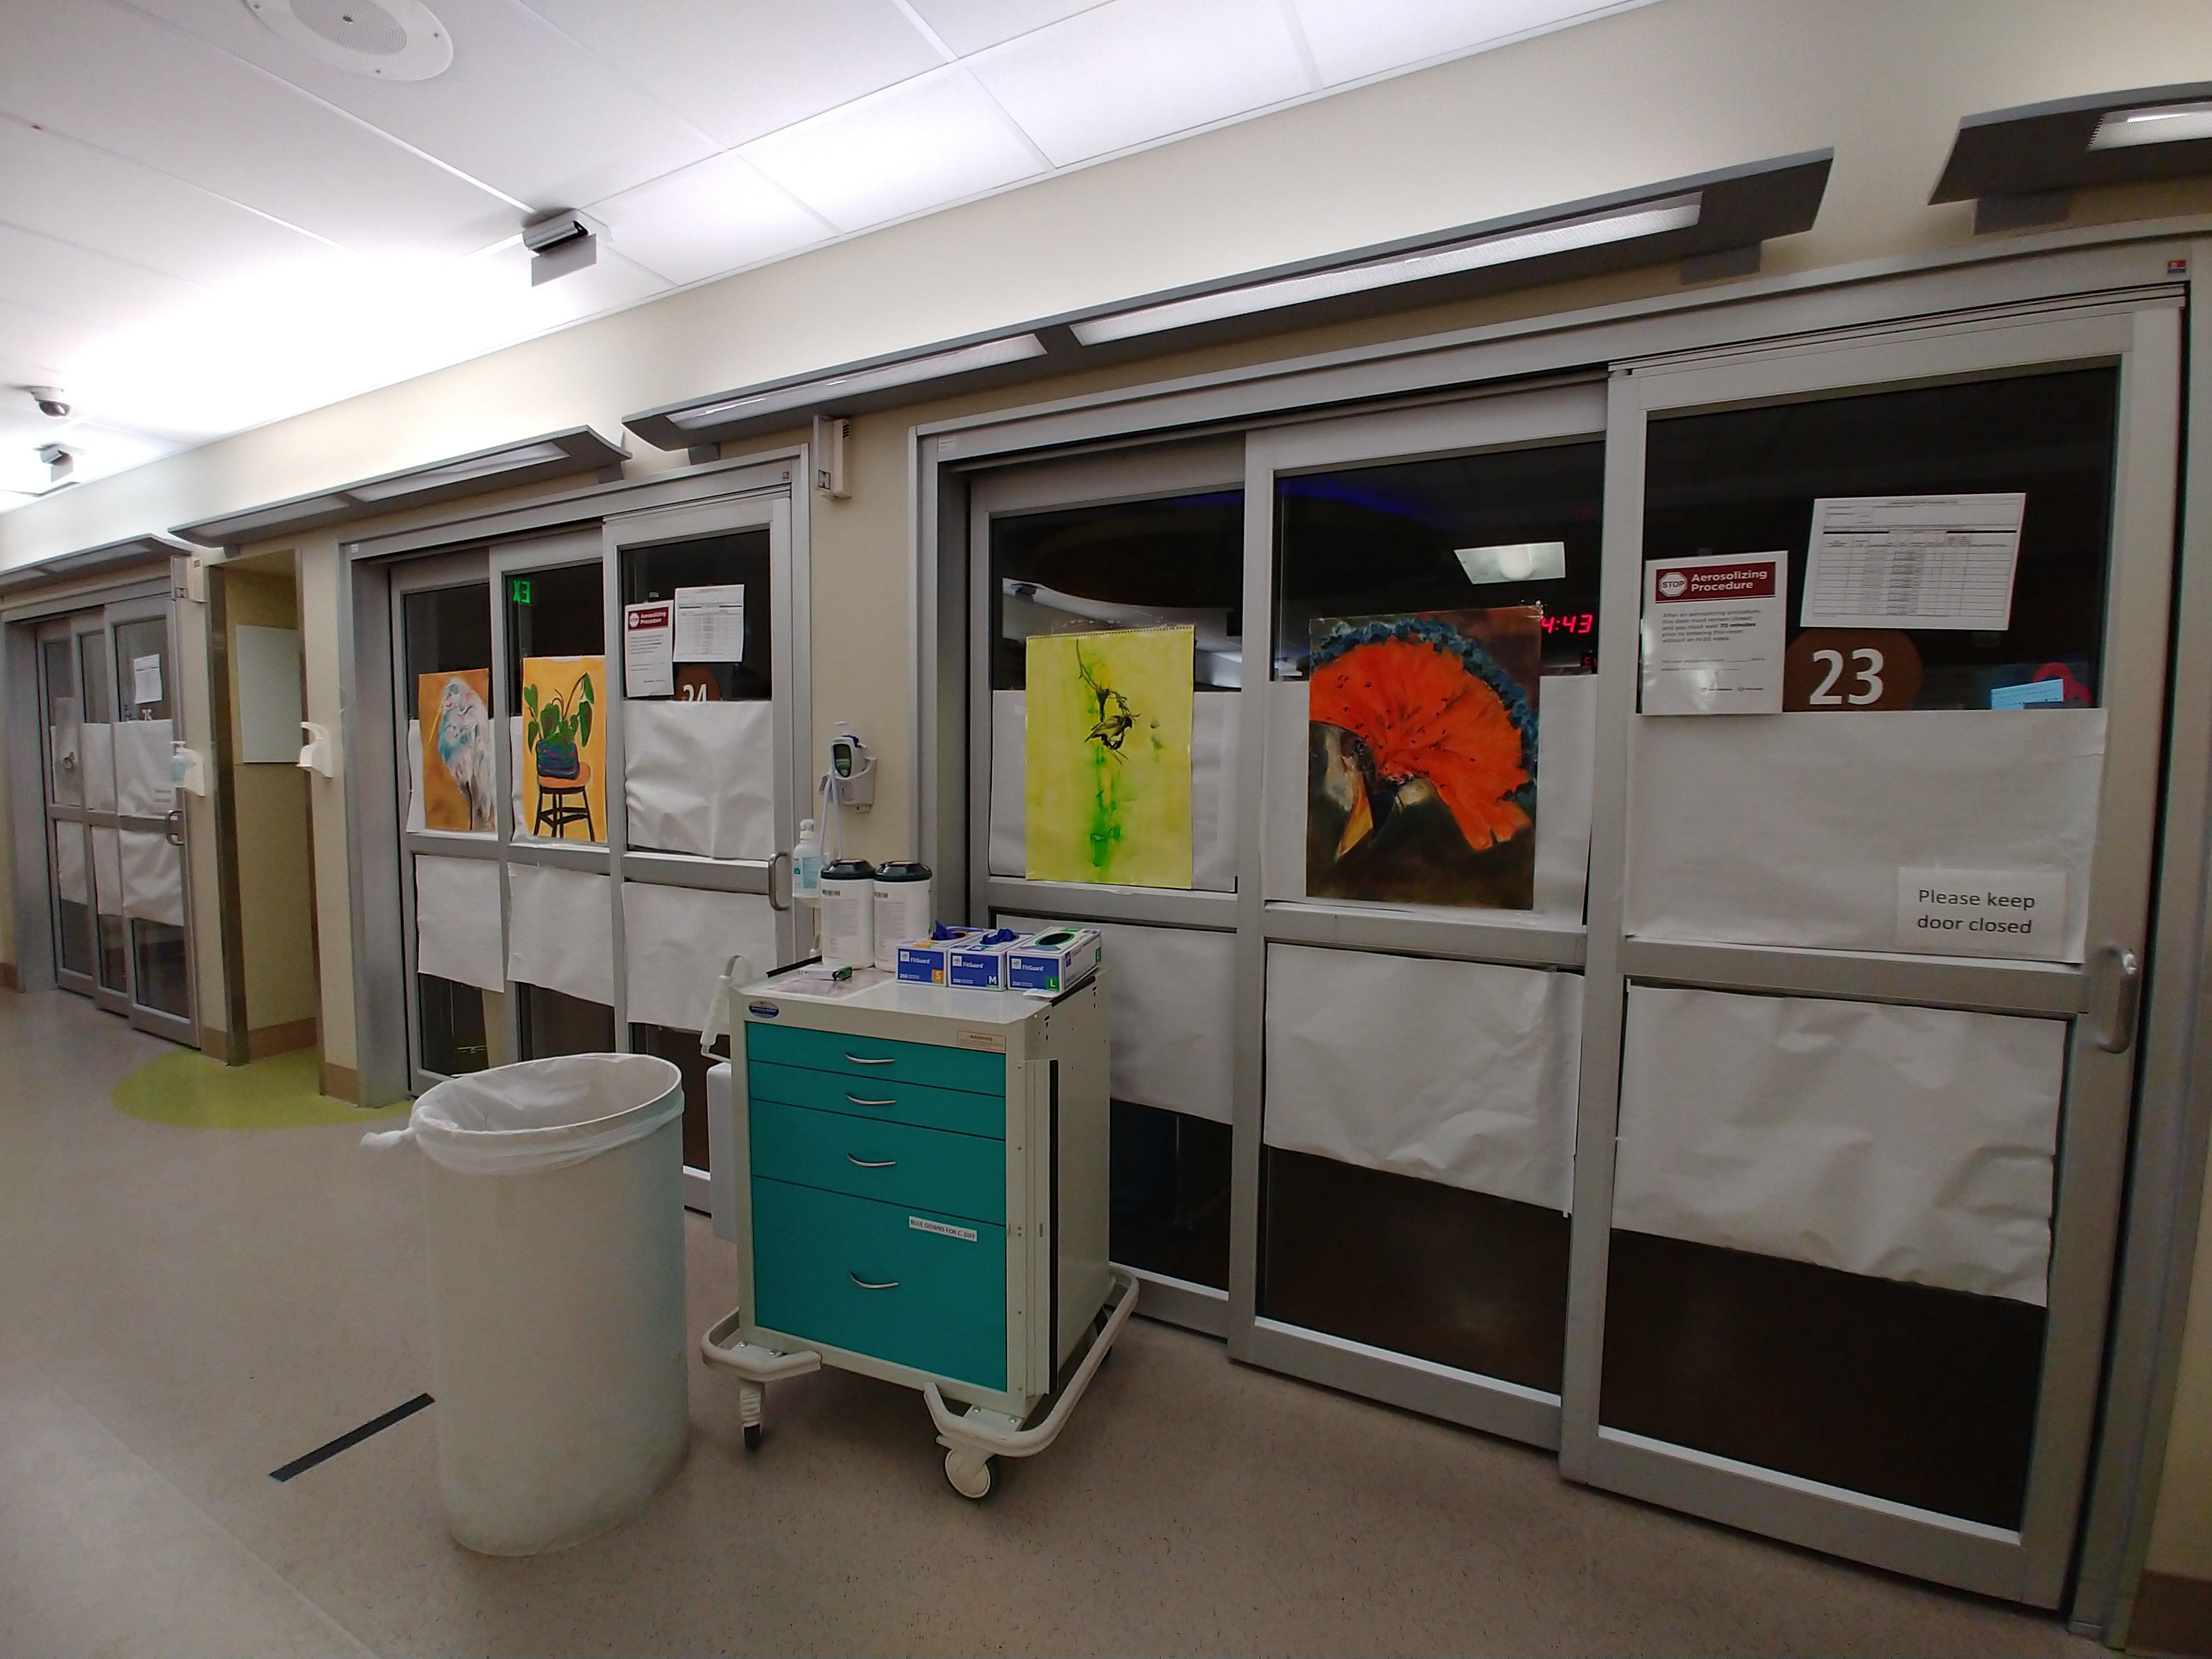 hospital doors with art